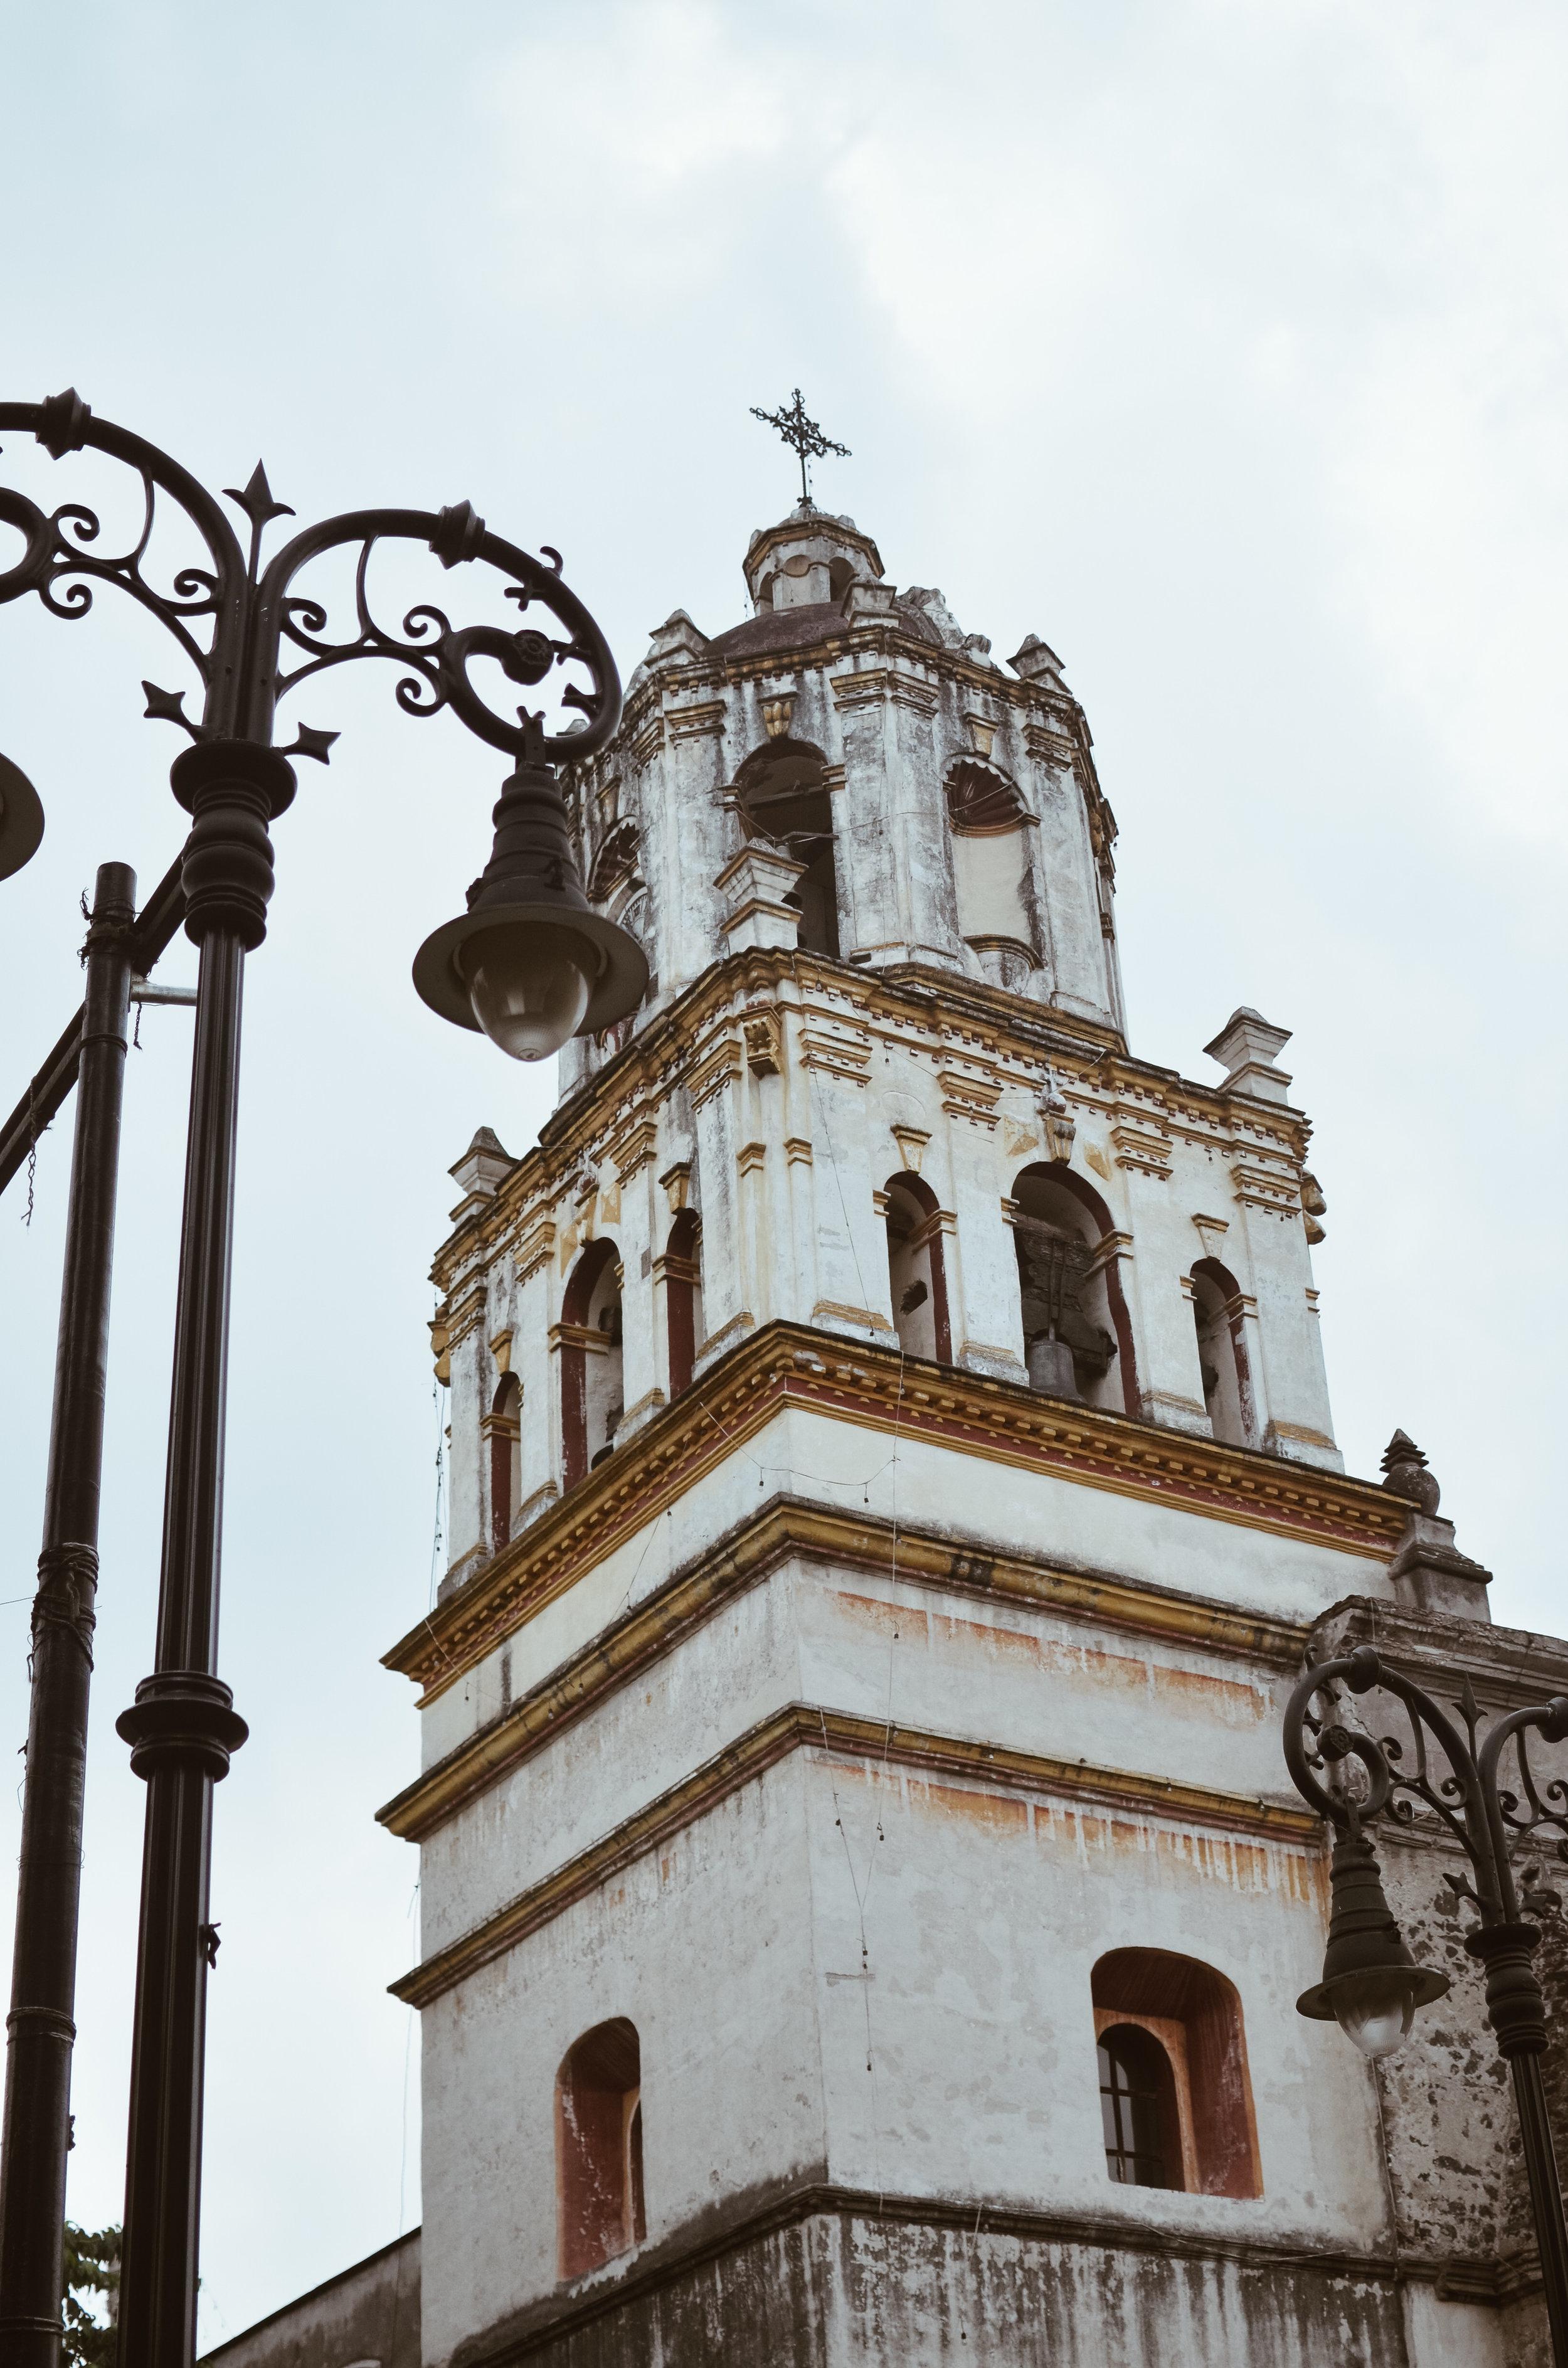 mexico+city+kate+parrish+life+on+pine_DSC_0253.jpg